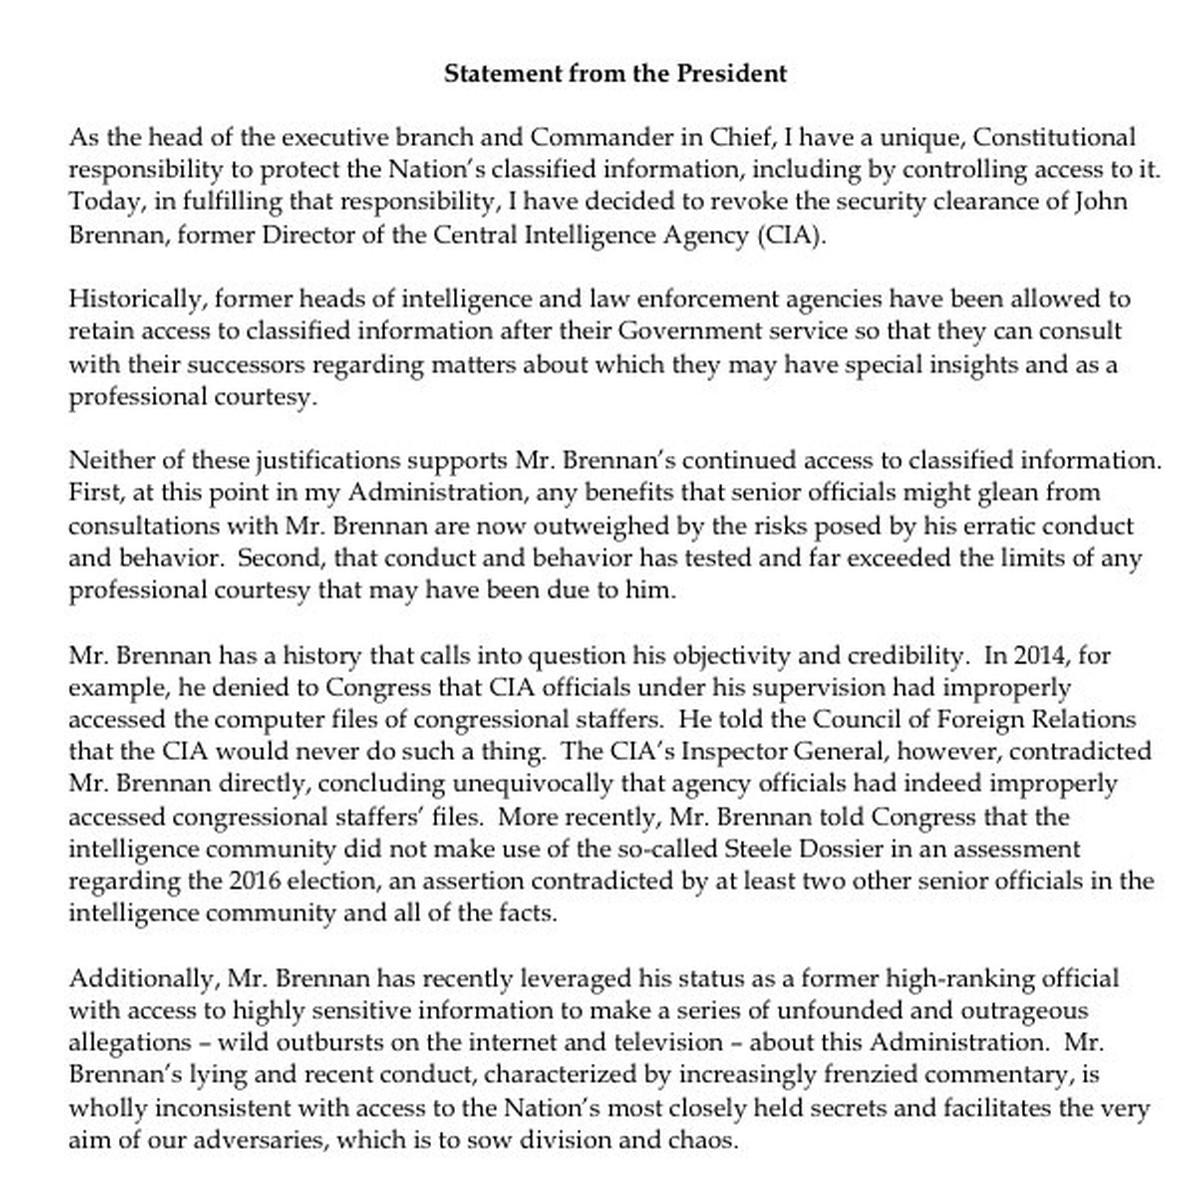 Trump Revokes John Brennan's Security Clearance For